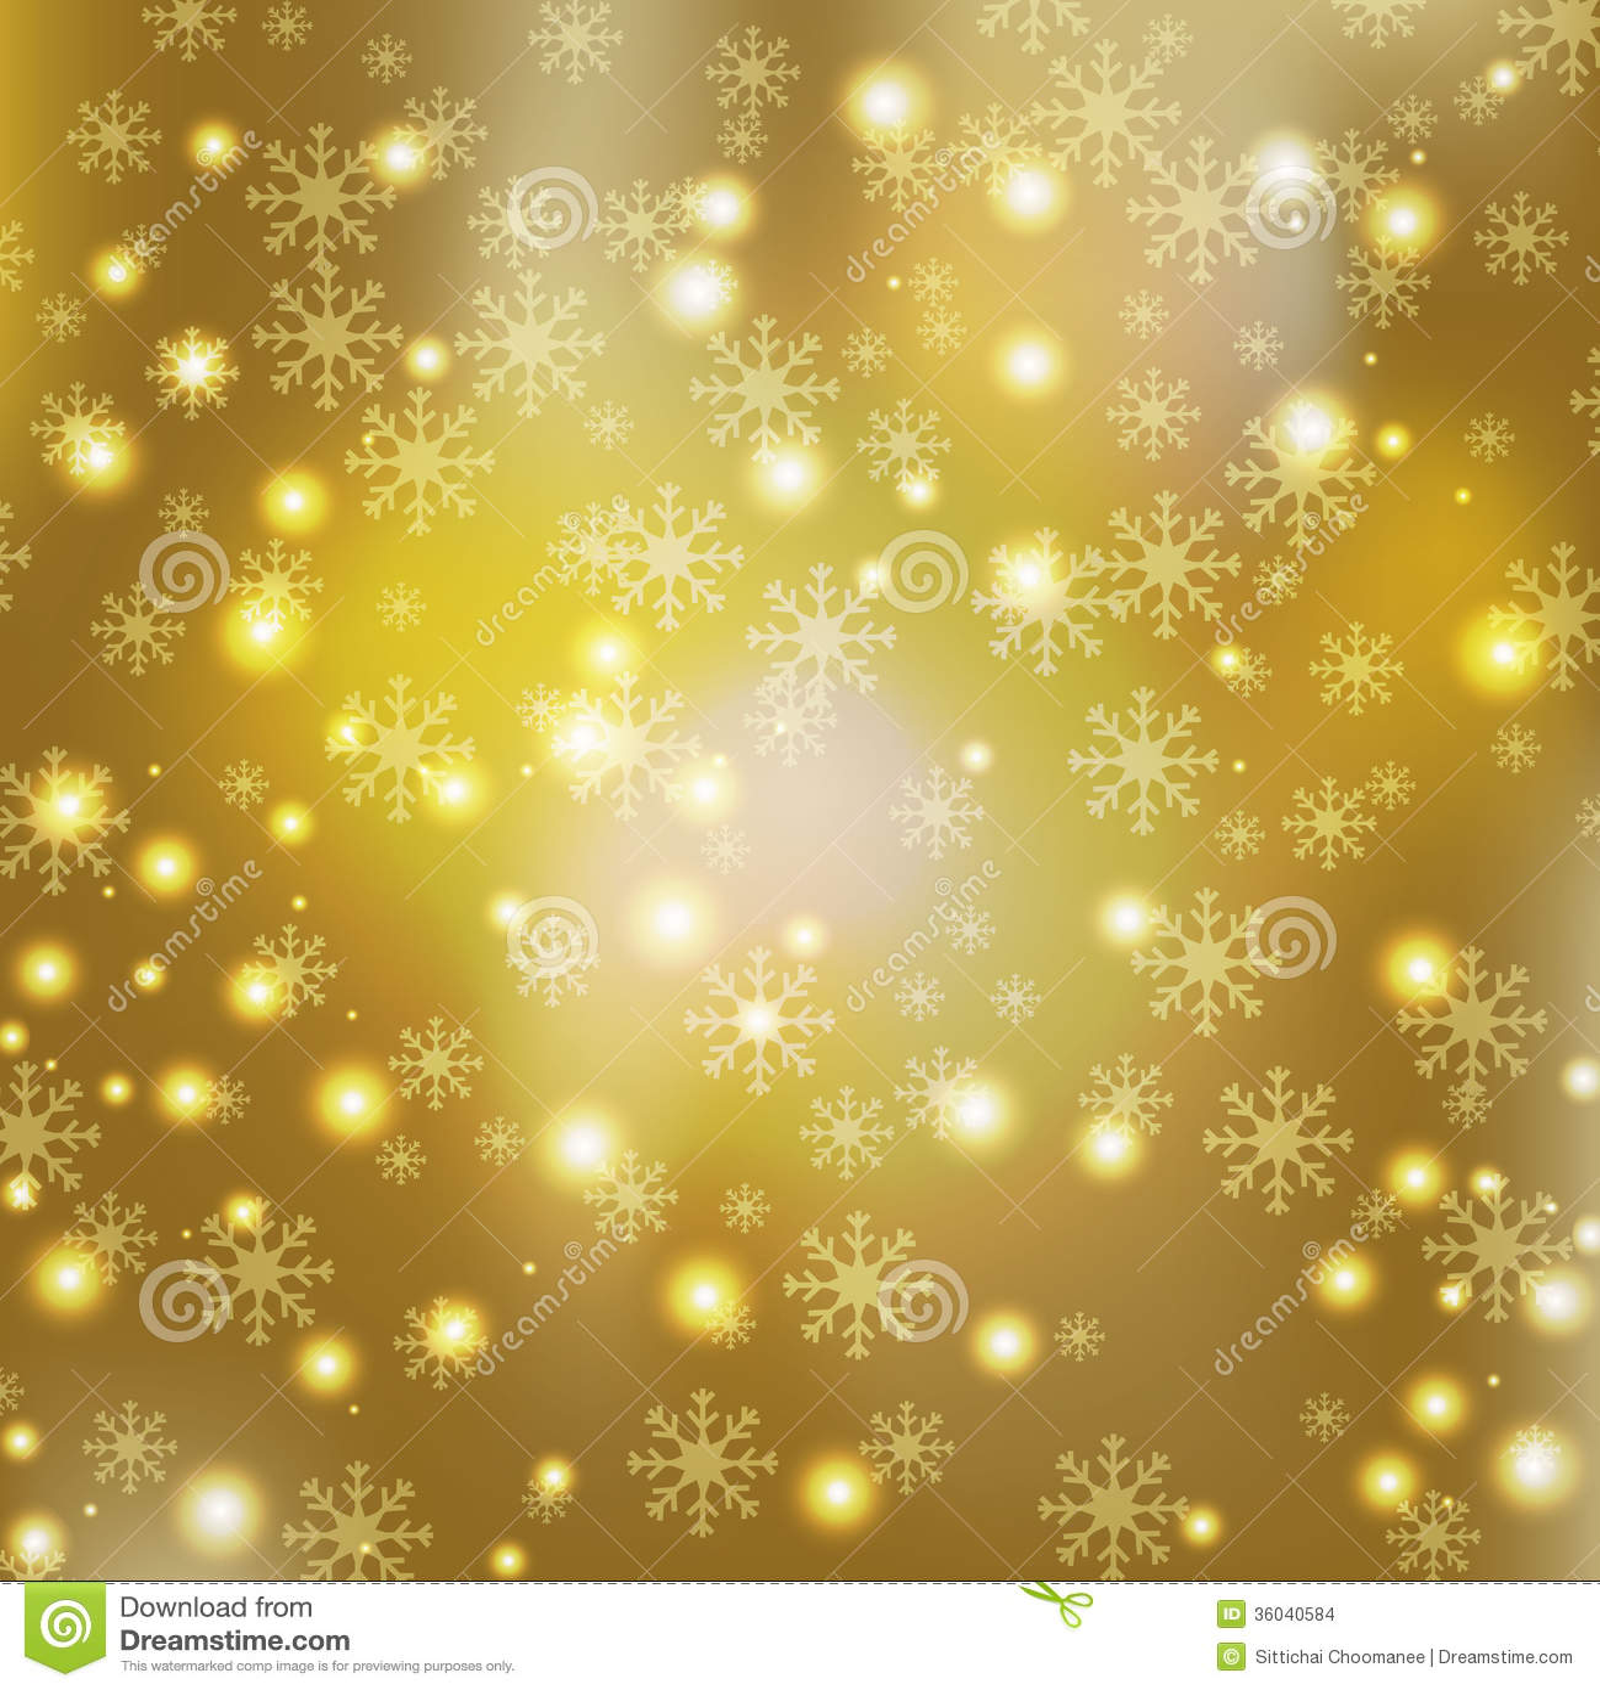 christmas desktop backgrounds - Christmas Desktop Background